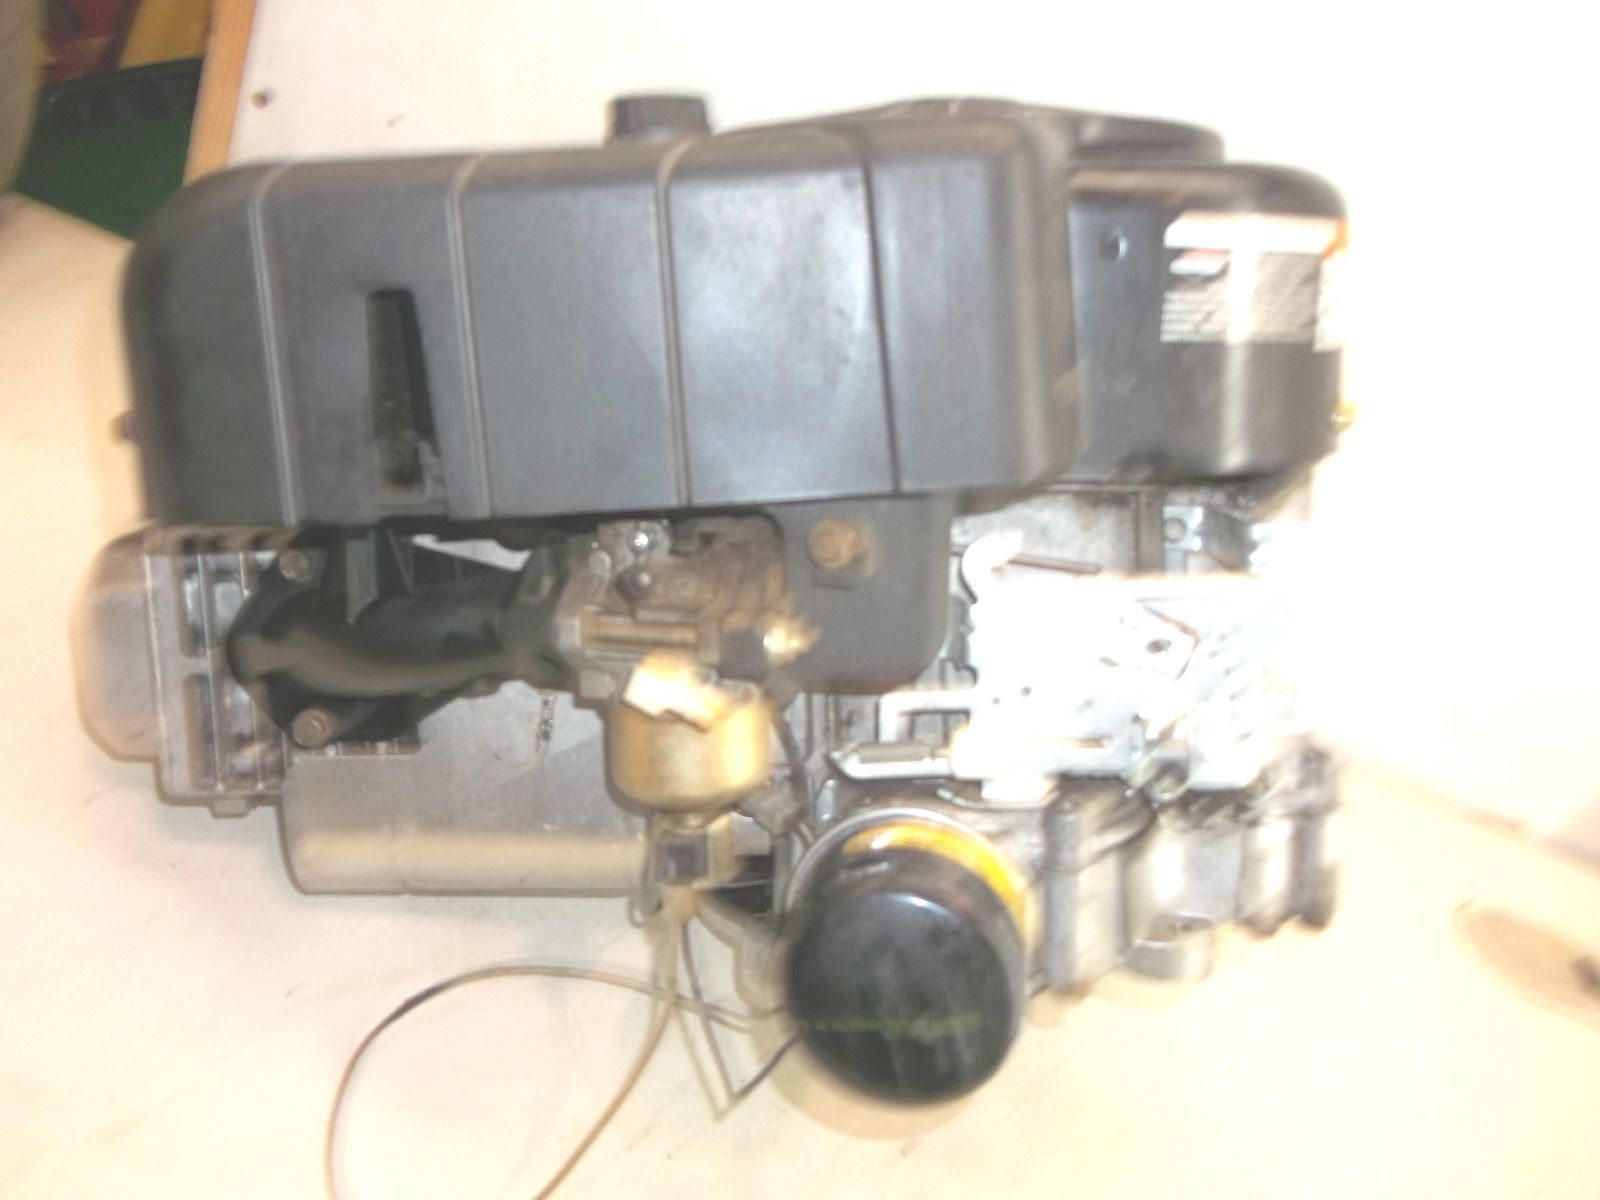 1999 Troy Bilt 17 42 Lawn Tractor Part 17 Hp Briggs Intek And Stratton Engine Lawn Tractor Tractor Parts Stratton